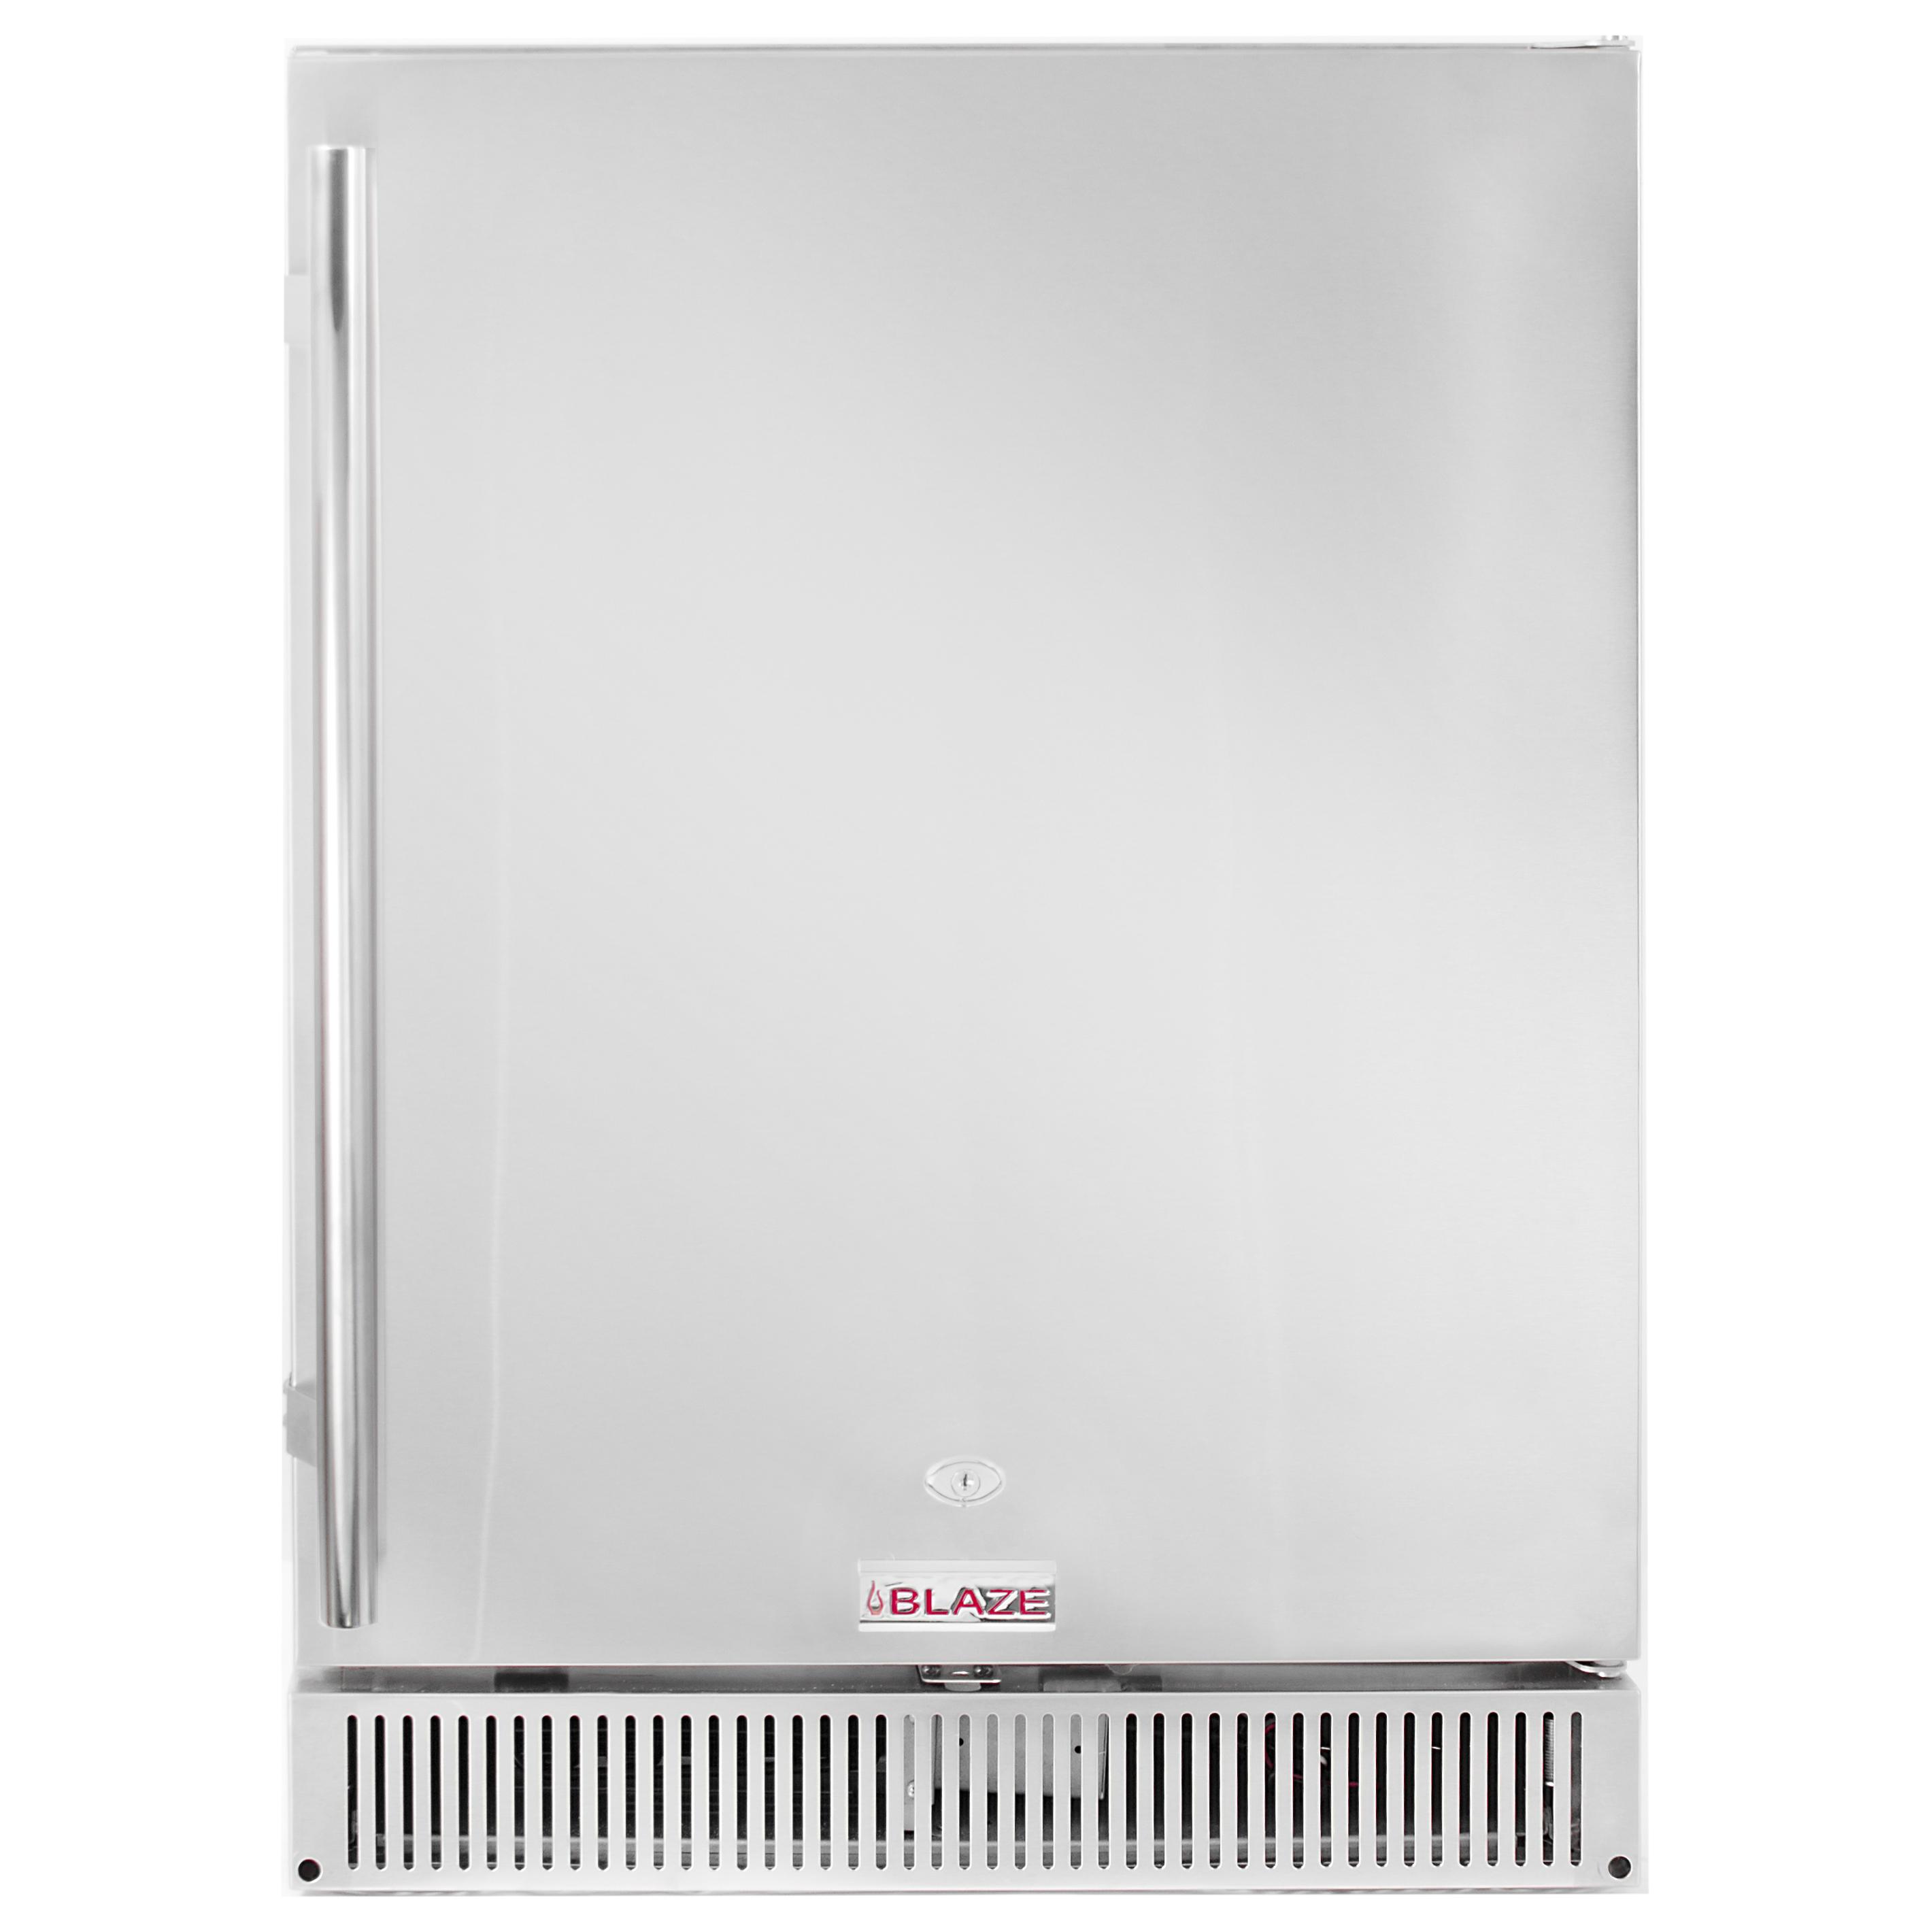 "Blaze Outdoor Rated Stainless 24"" Refrigerator 5.2 CU - Blaze Grills"